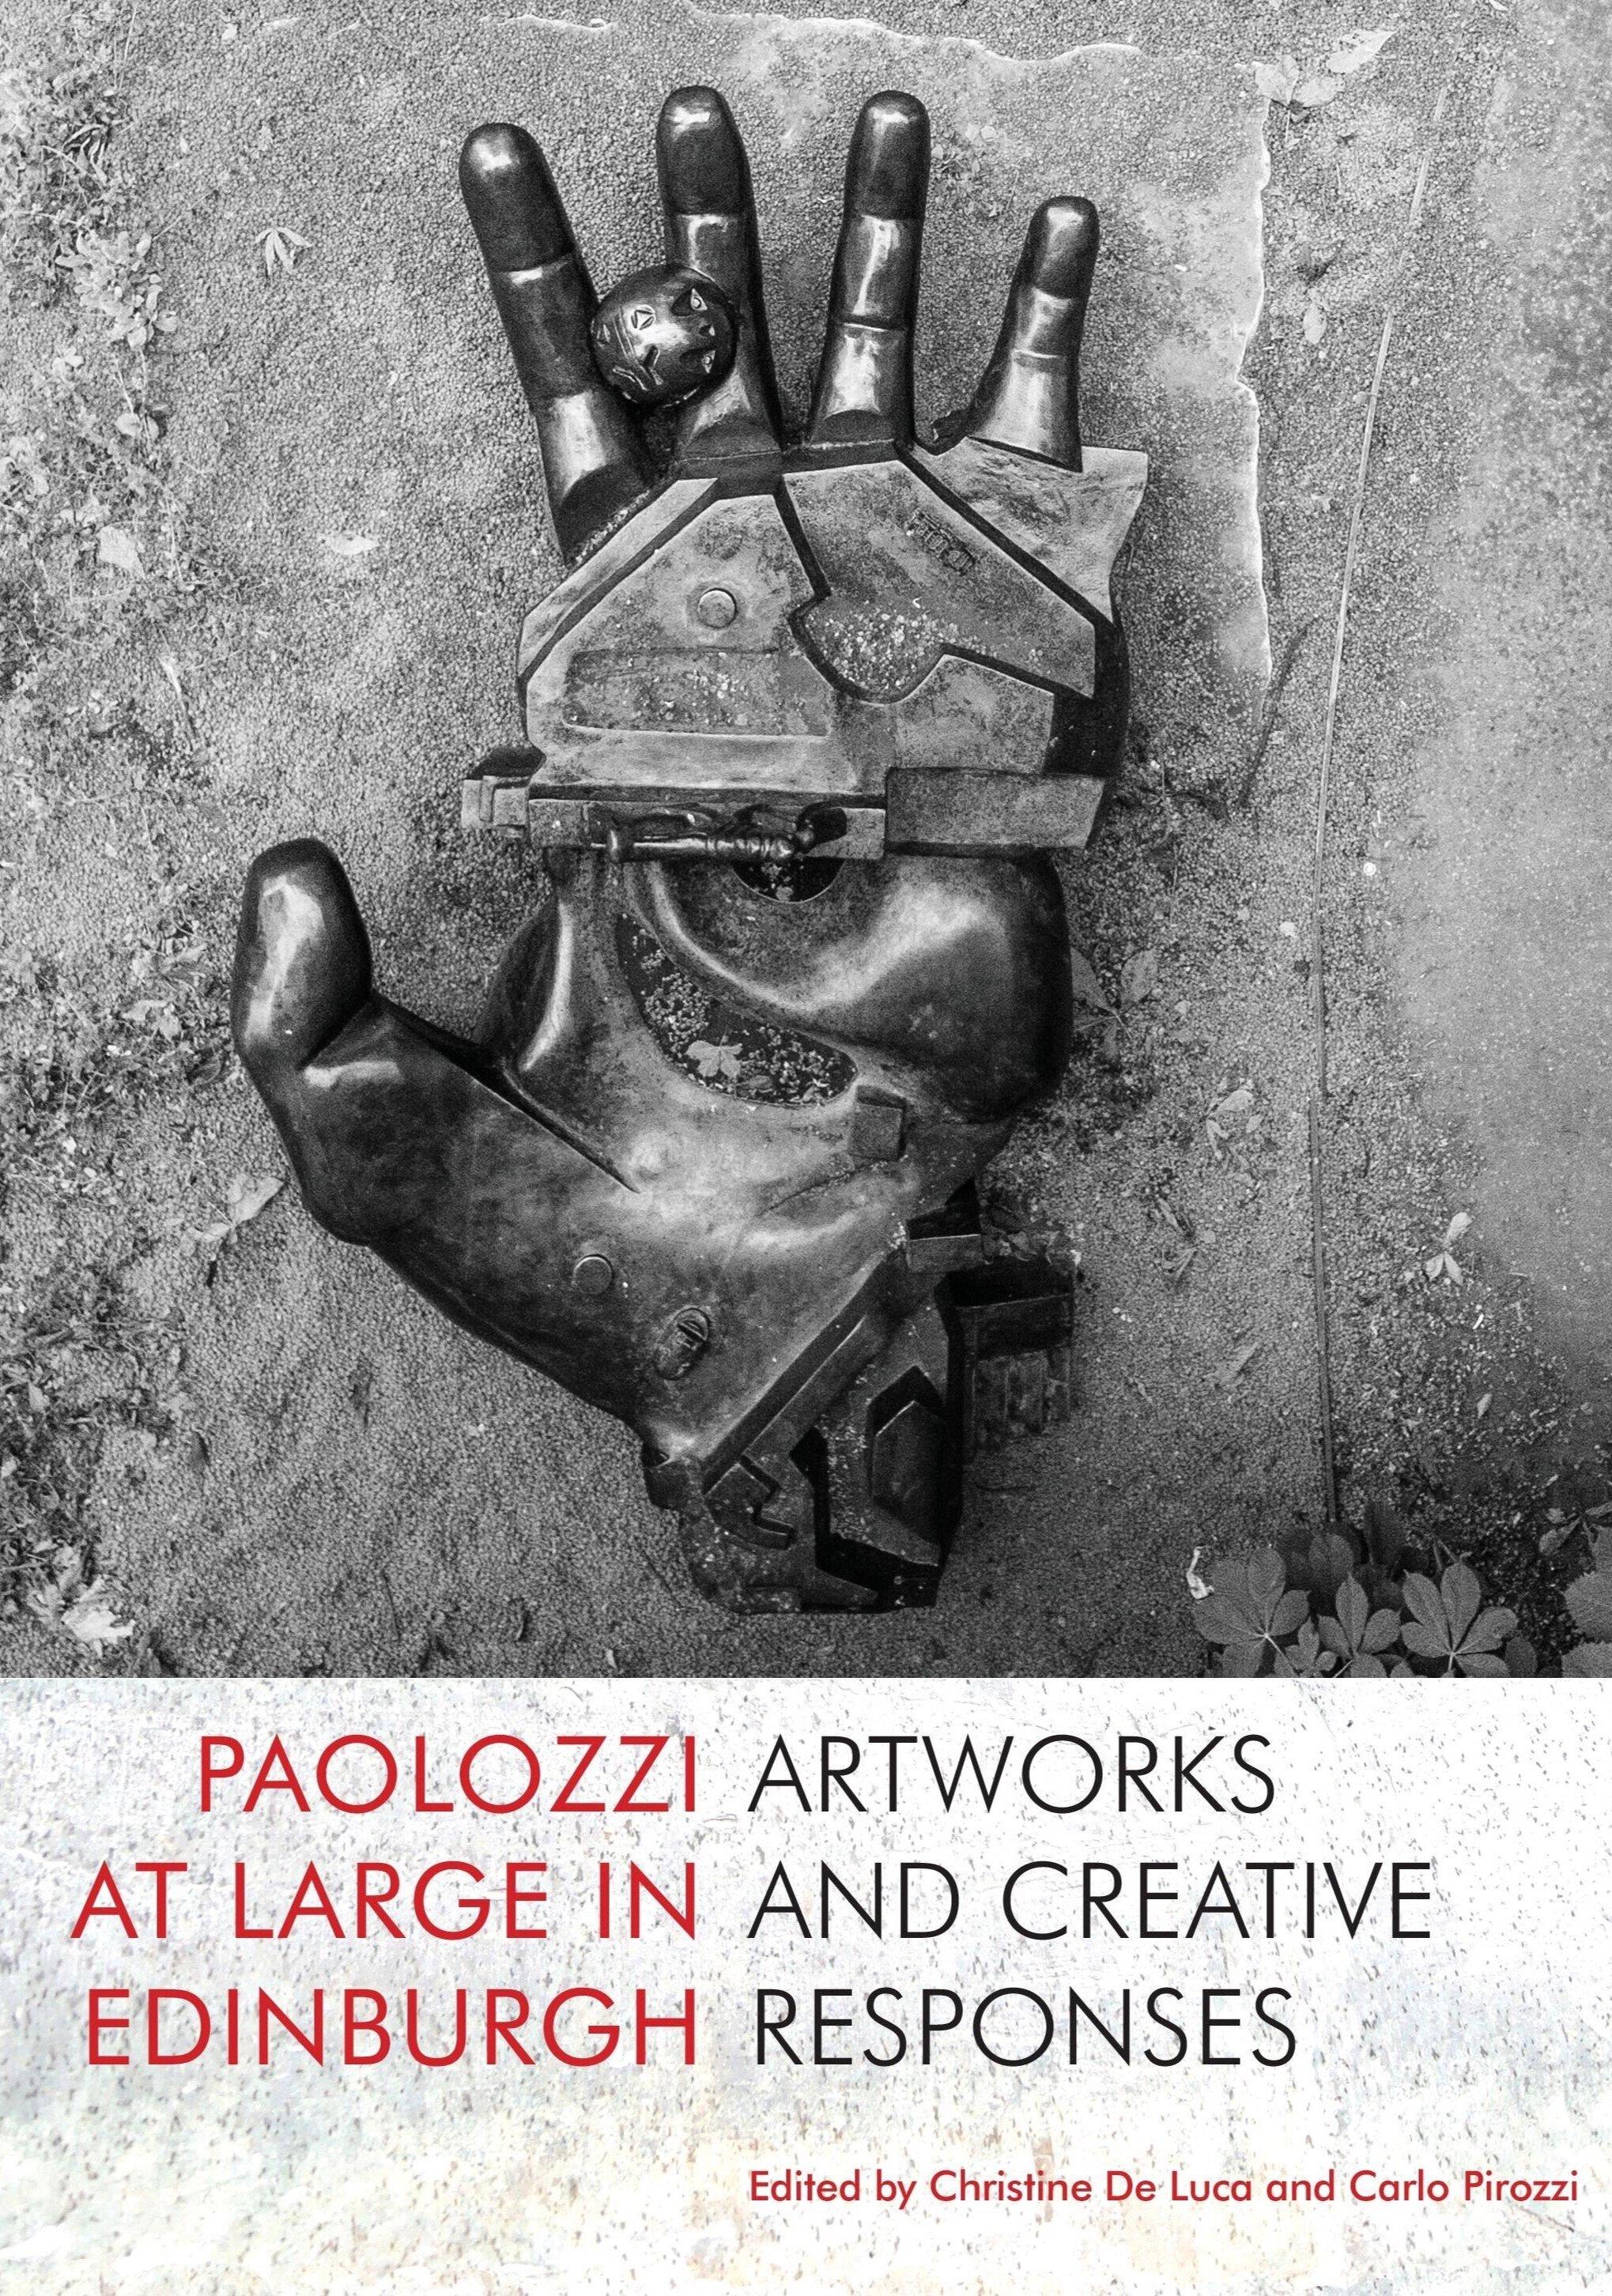 Paolozzi+at+Large+in+Edinburgh+Christine+de+Luca+and+Carlo+Pirozzi+9781912147885+Luath+Press.jpg